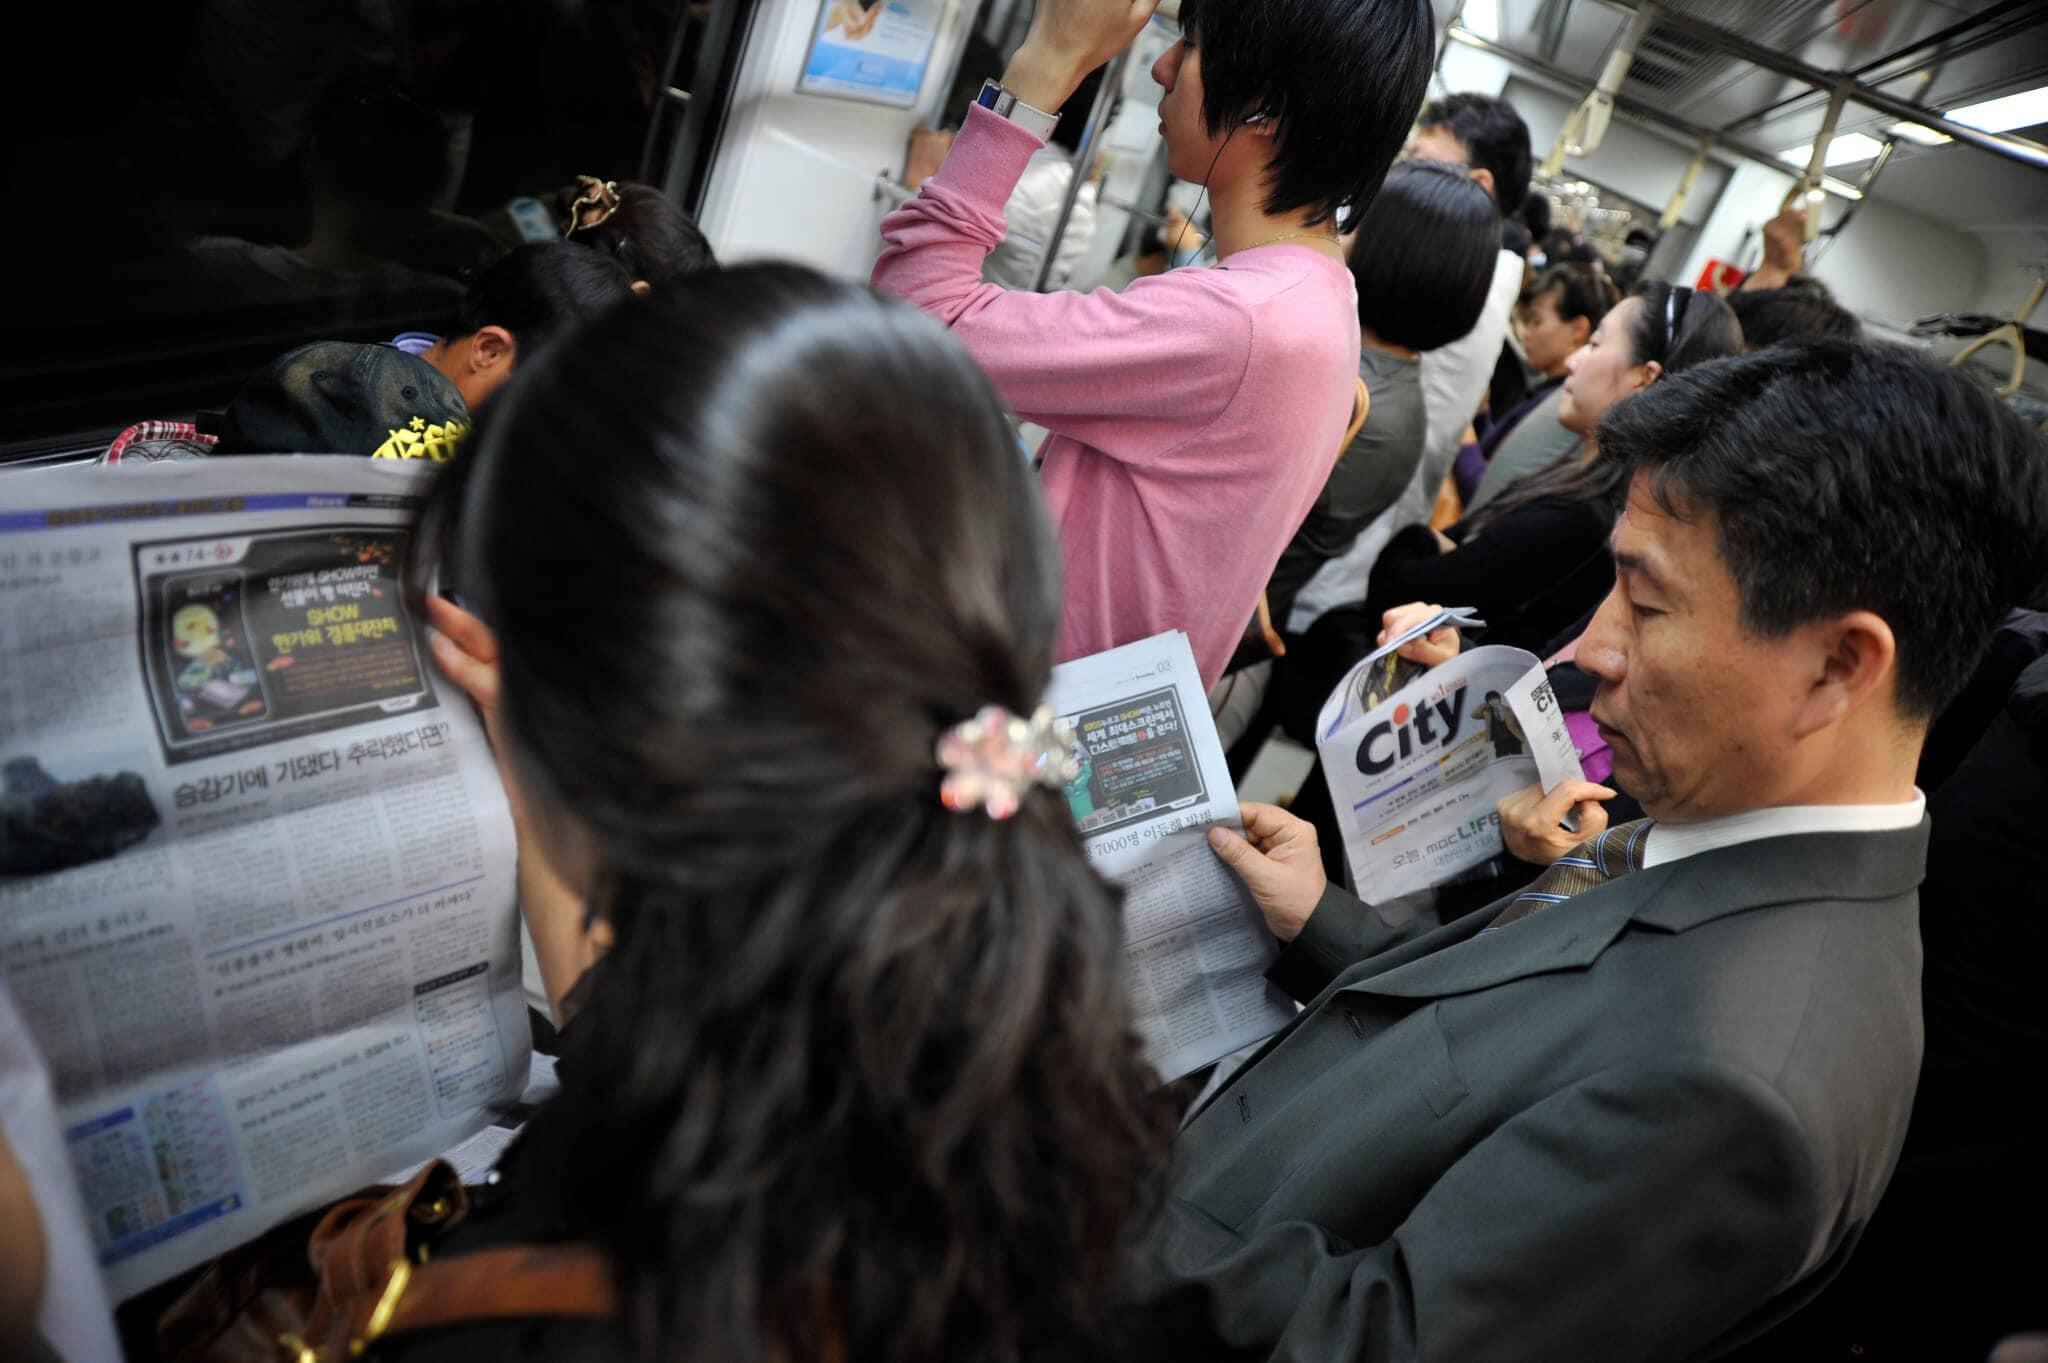 South Korea: Criminal defamation provisions threaten freedom of